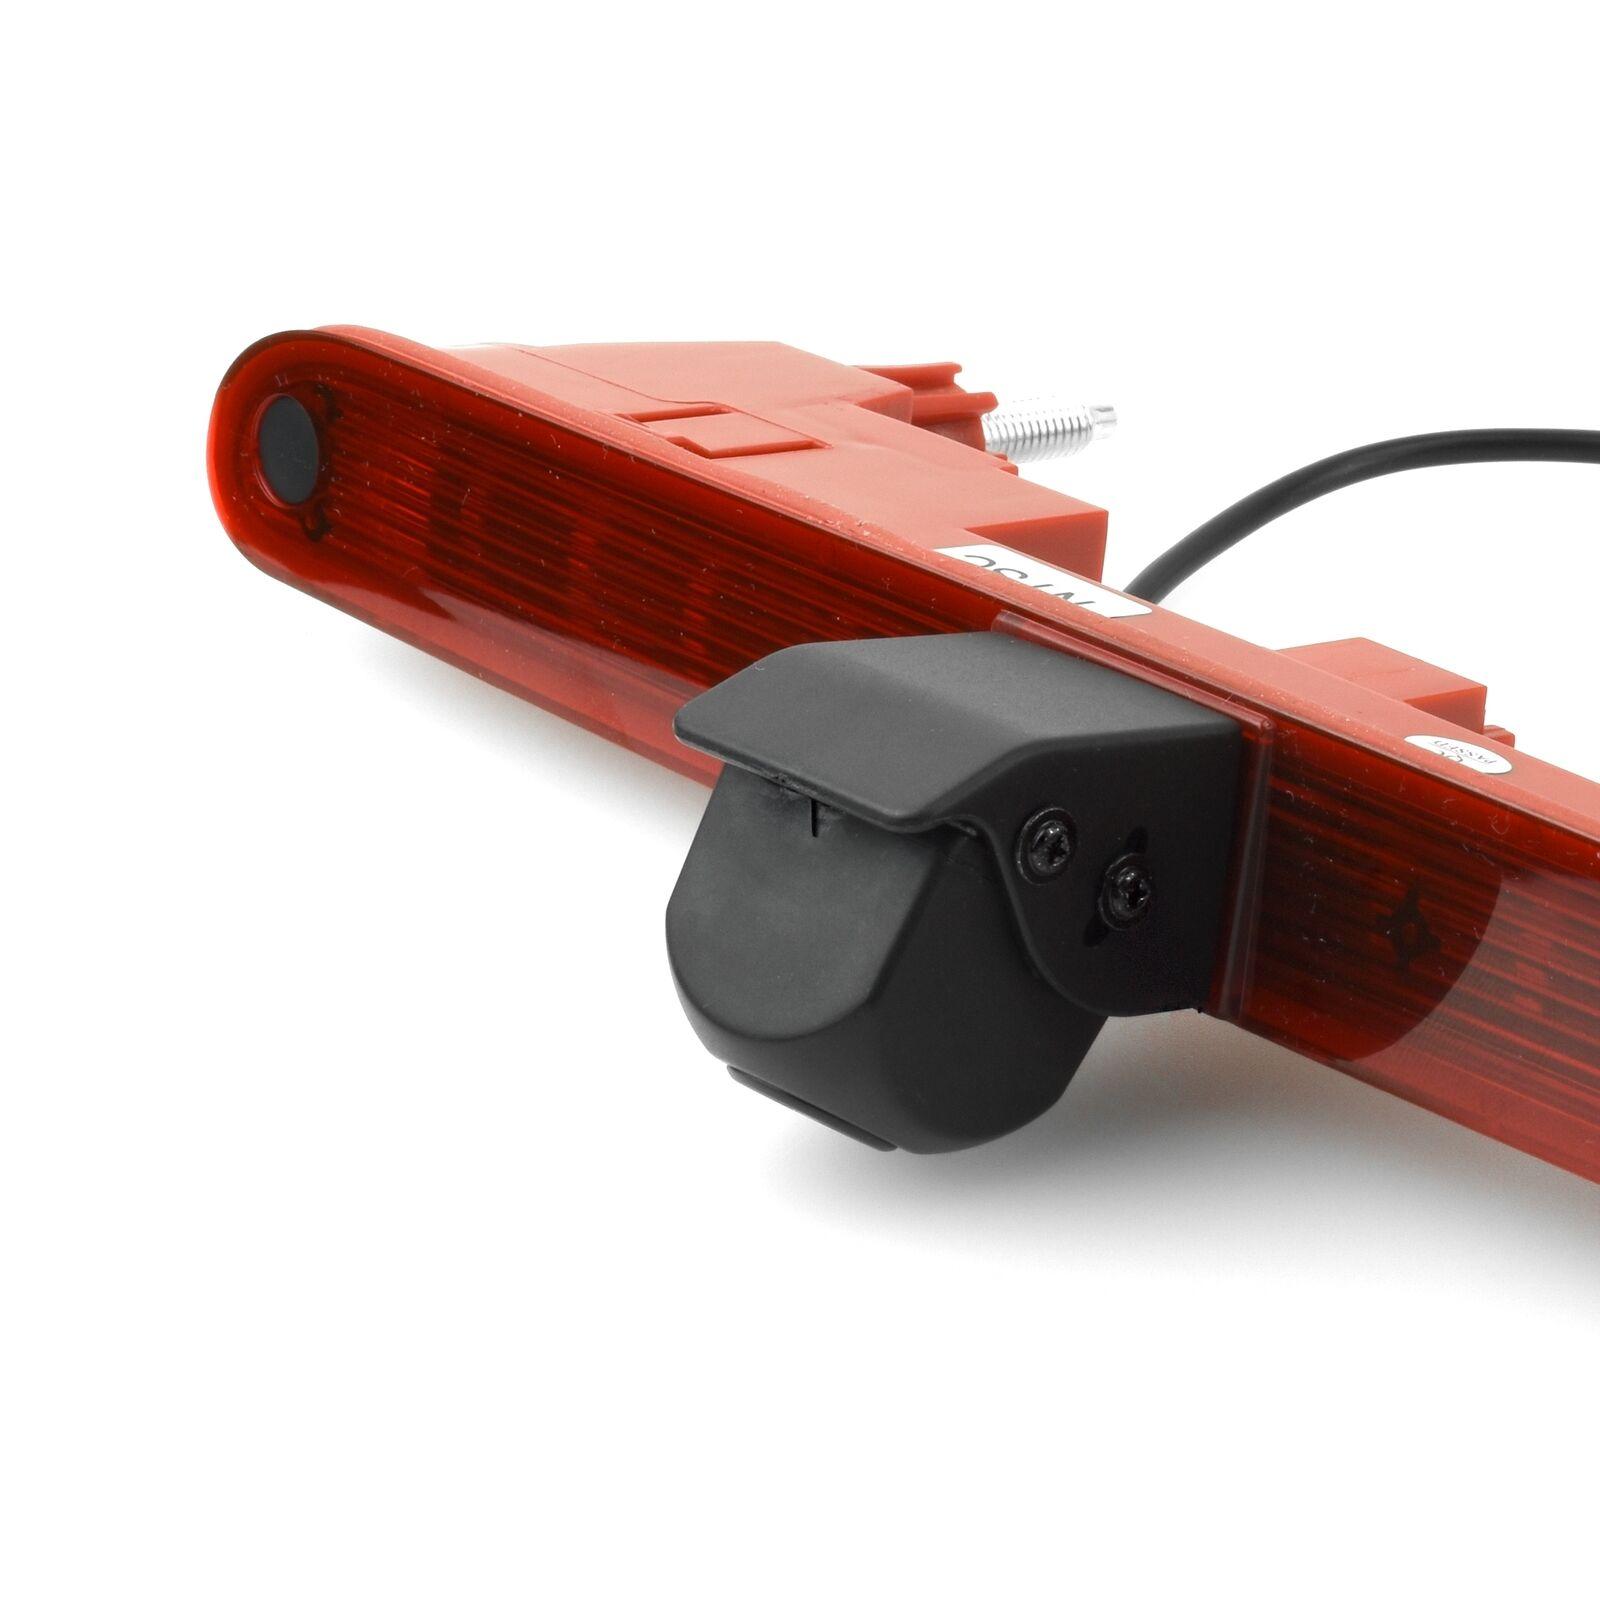 Brake Light Rear View Reverse Parking Camera For Citroen Berlingo Peugeot Partner II 2008-2016 Parking Camera Night Vision Water